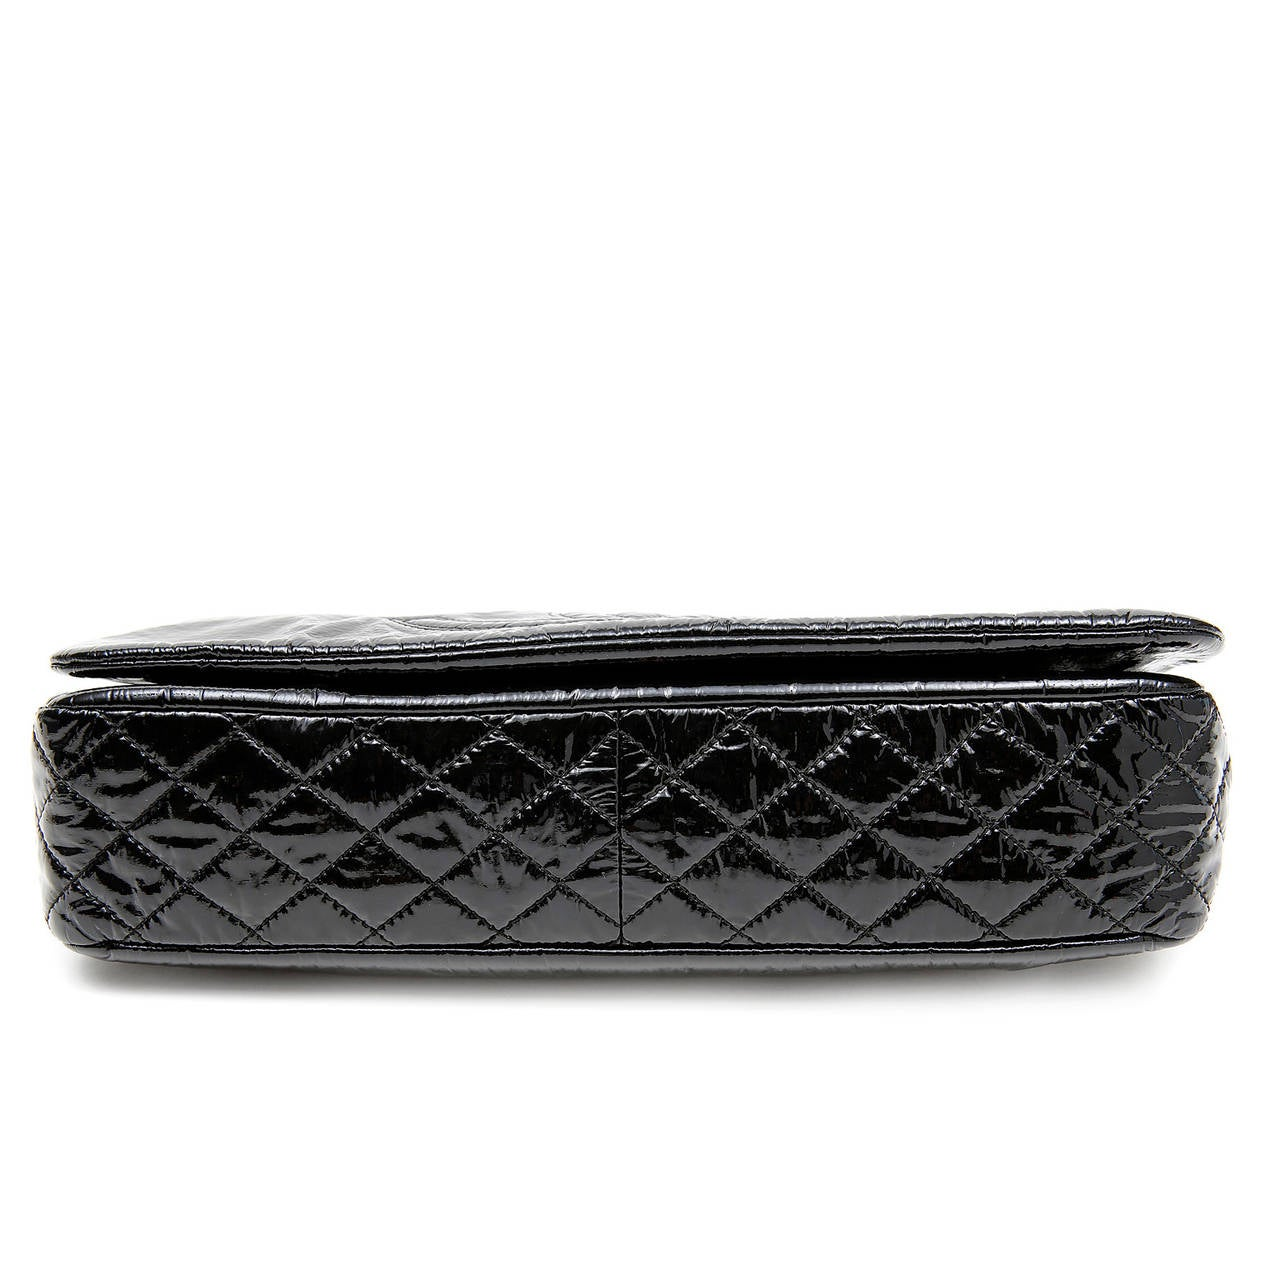 Chanel Black Patent Vinyl Flap Bag at 1stdibs